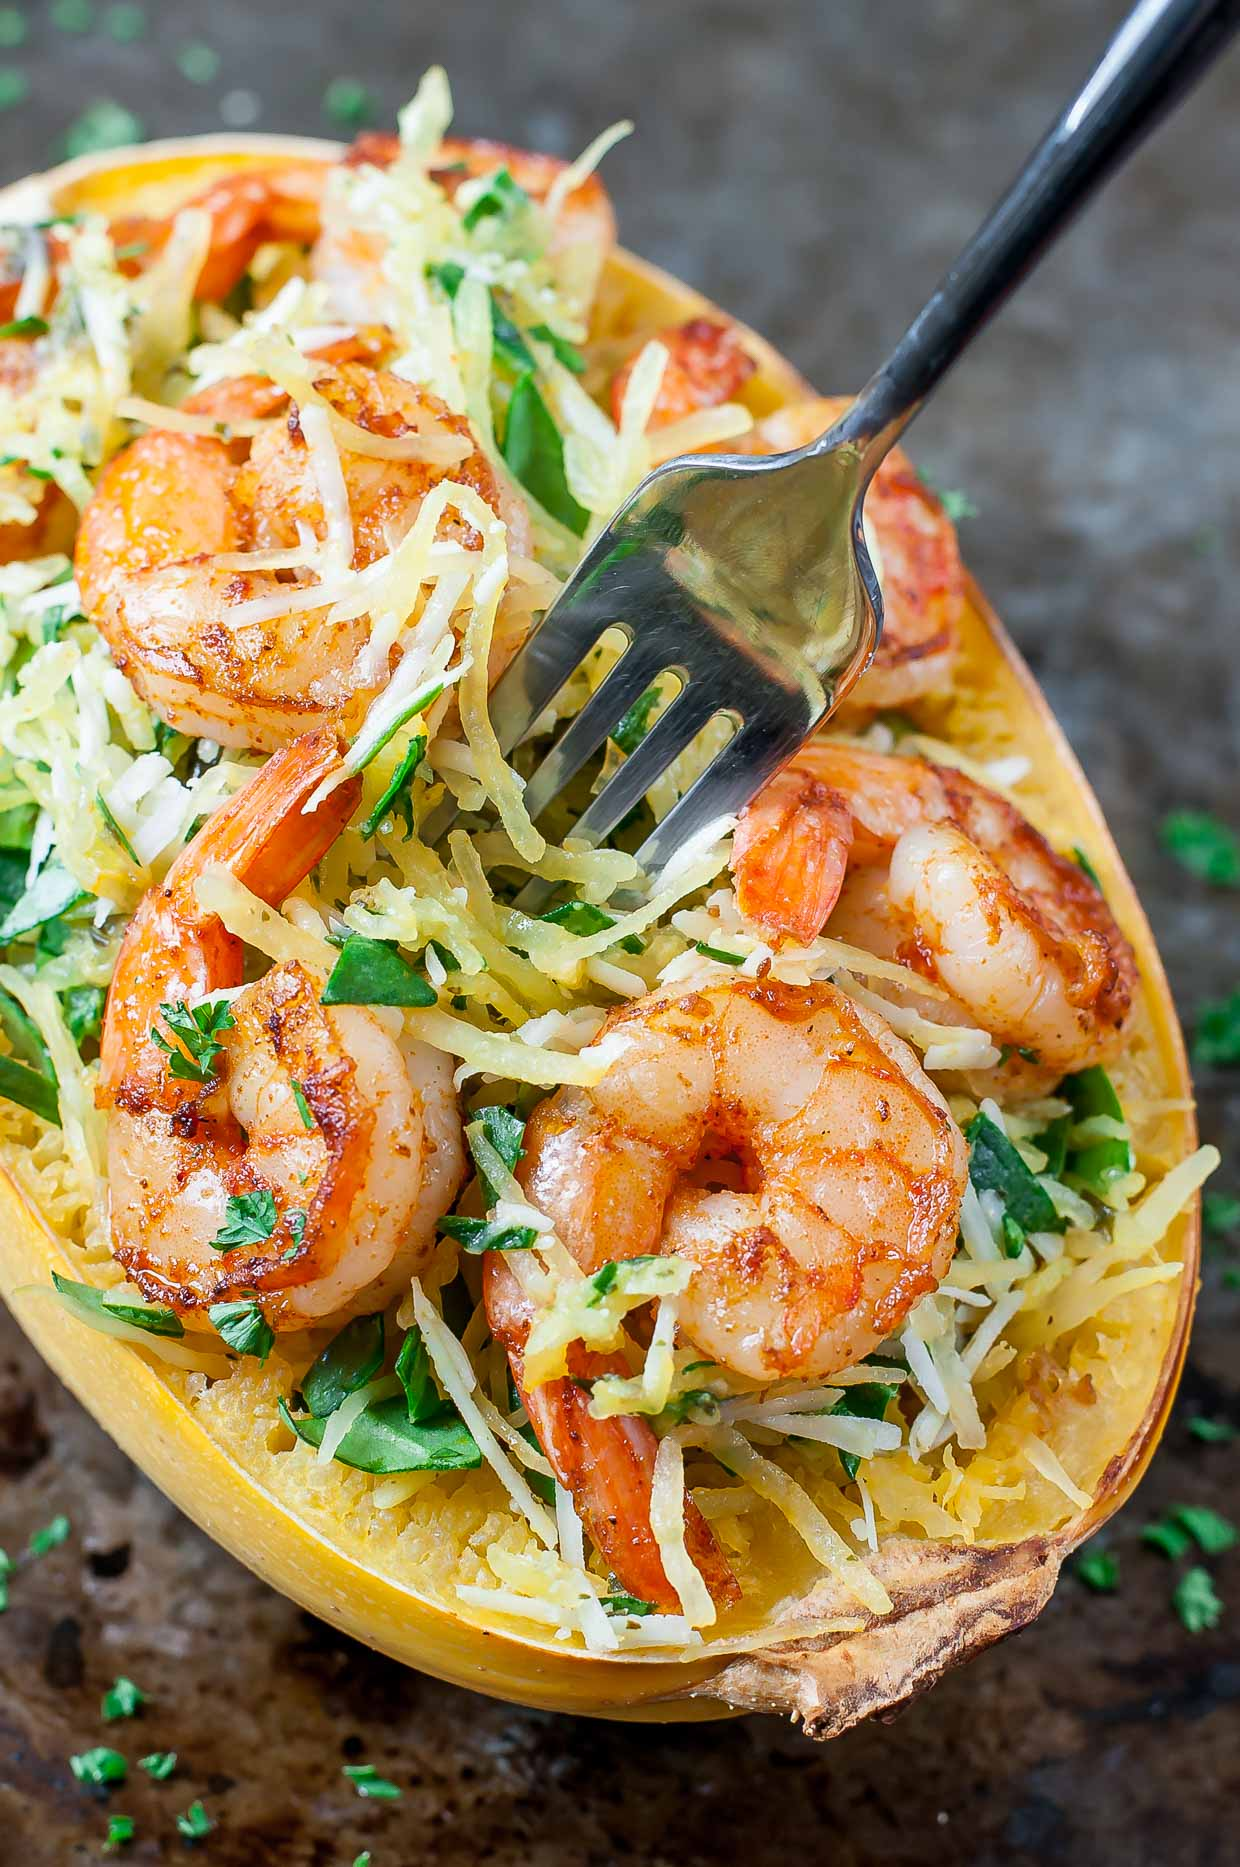 Parmesan Pesto Spaghetti Squash with Shrimp